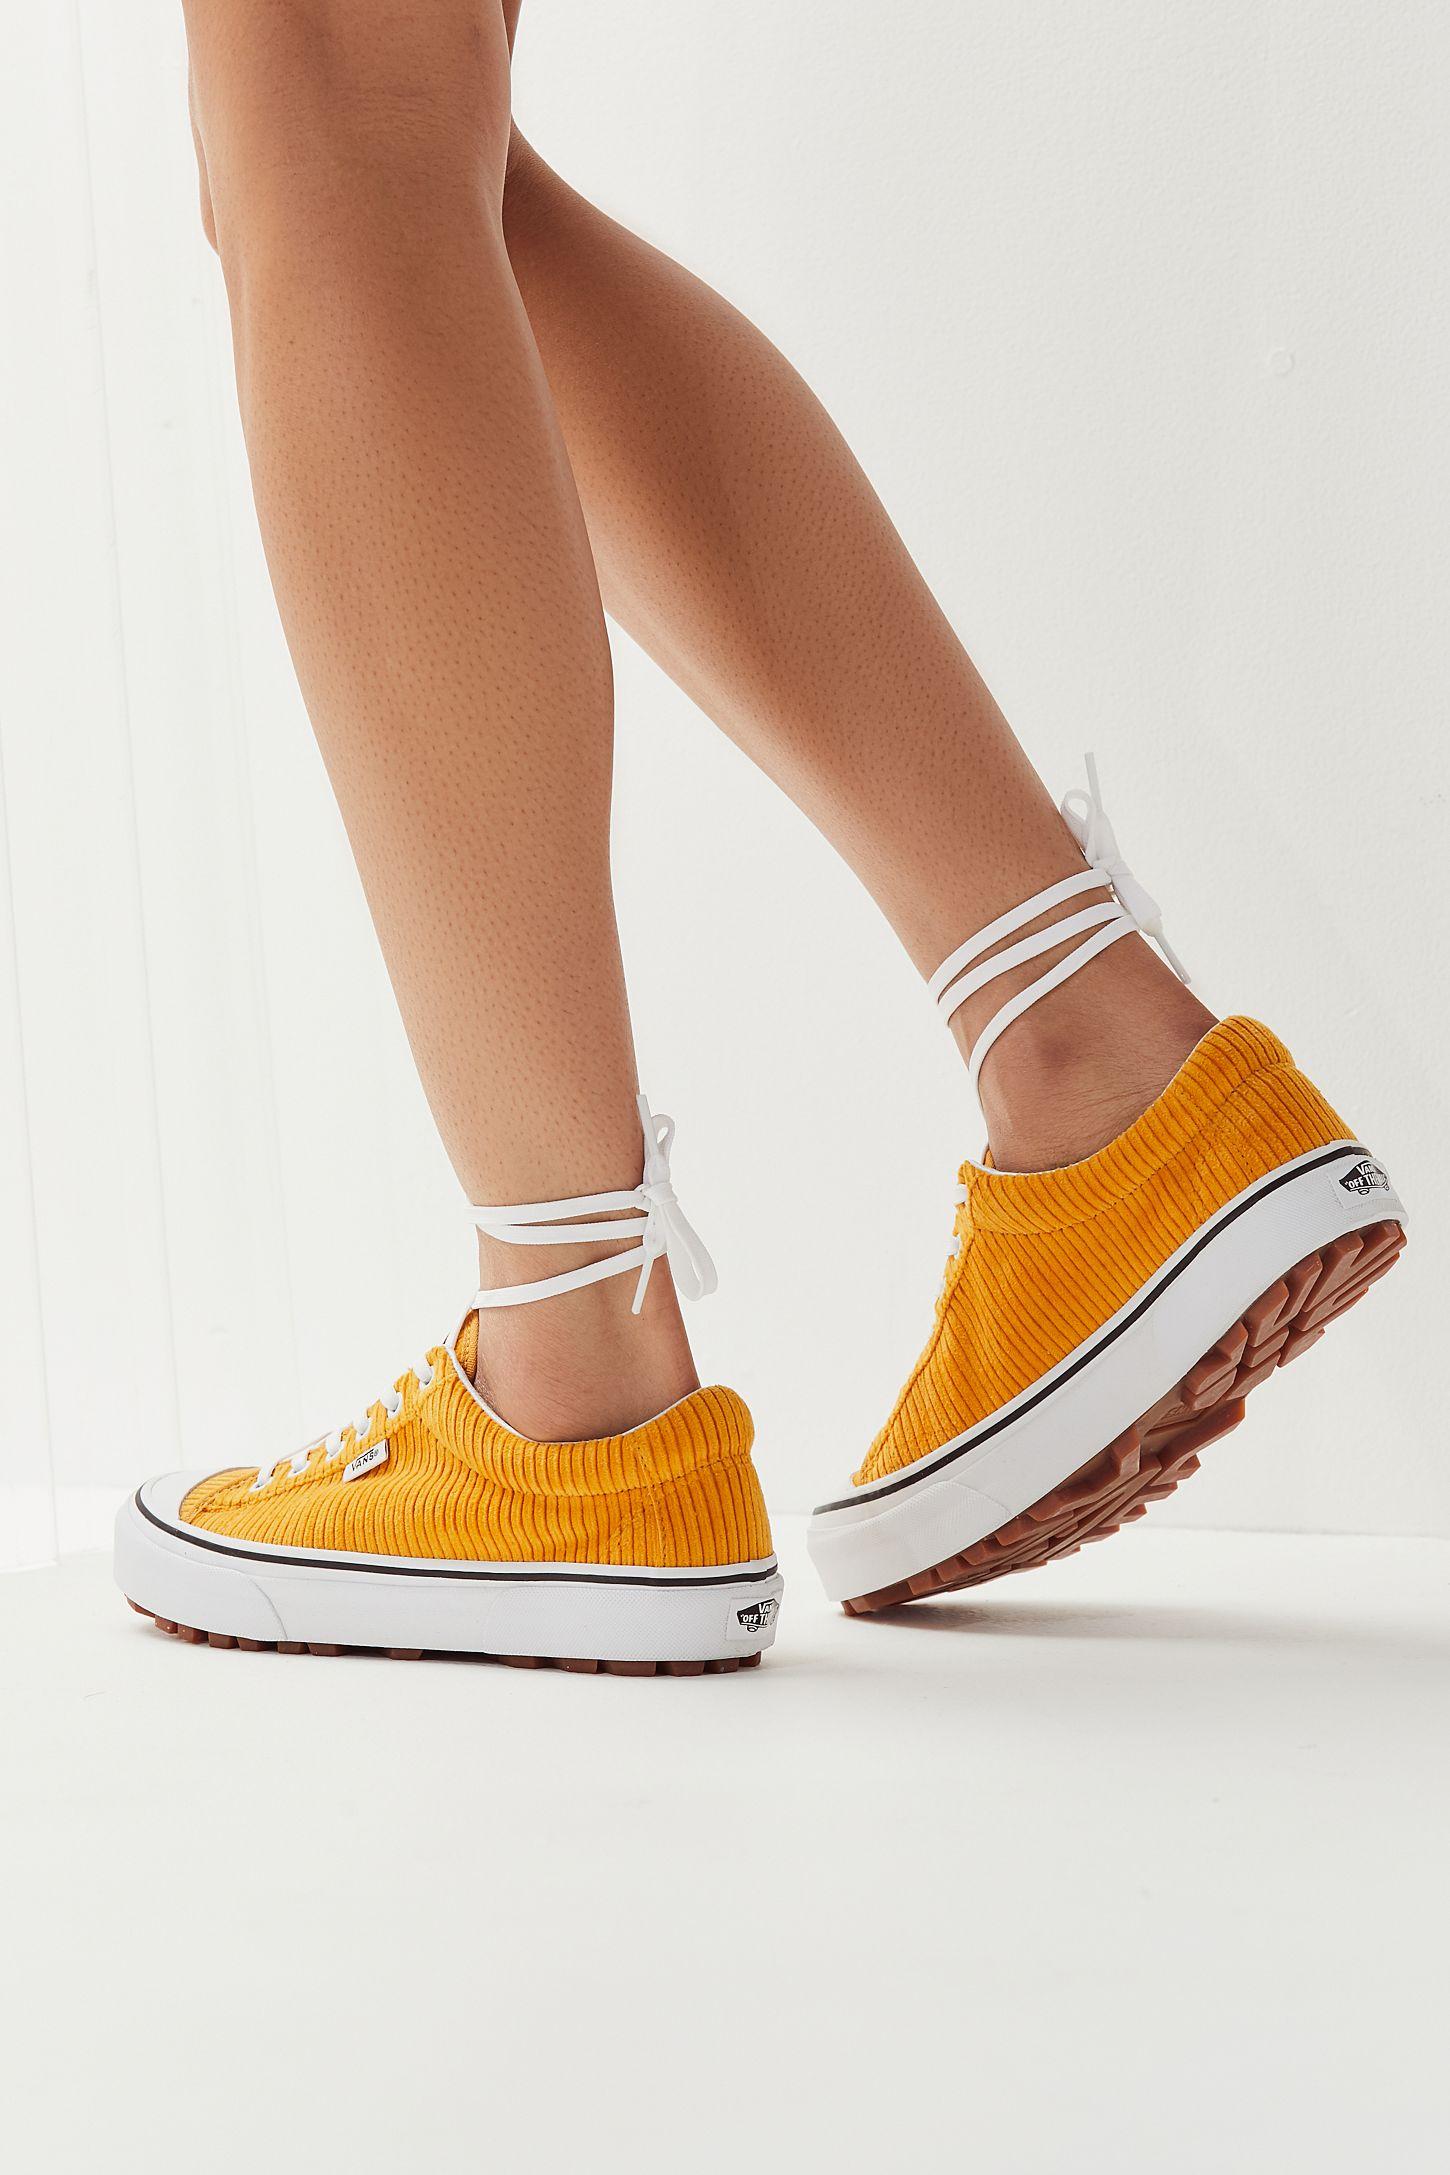 aa3942a01c Vans Anaheim Factory Style 29 Corduroy Sneaker